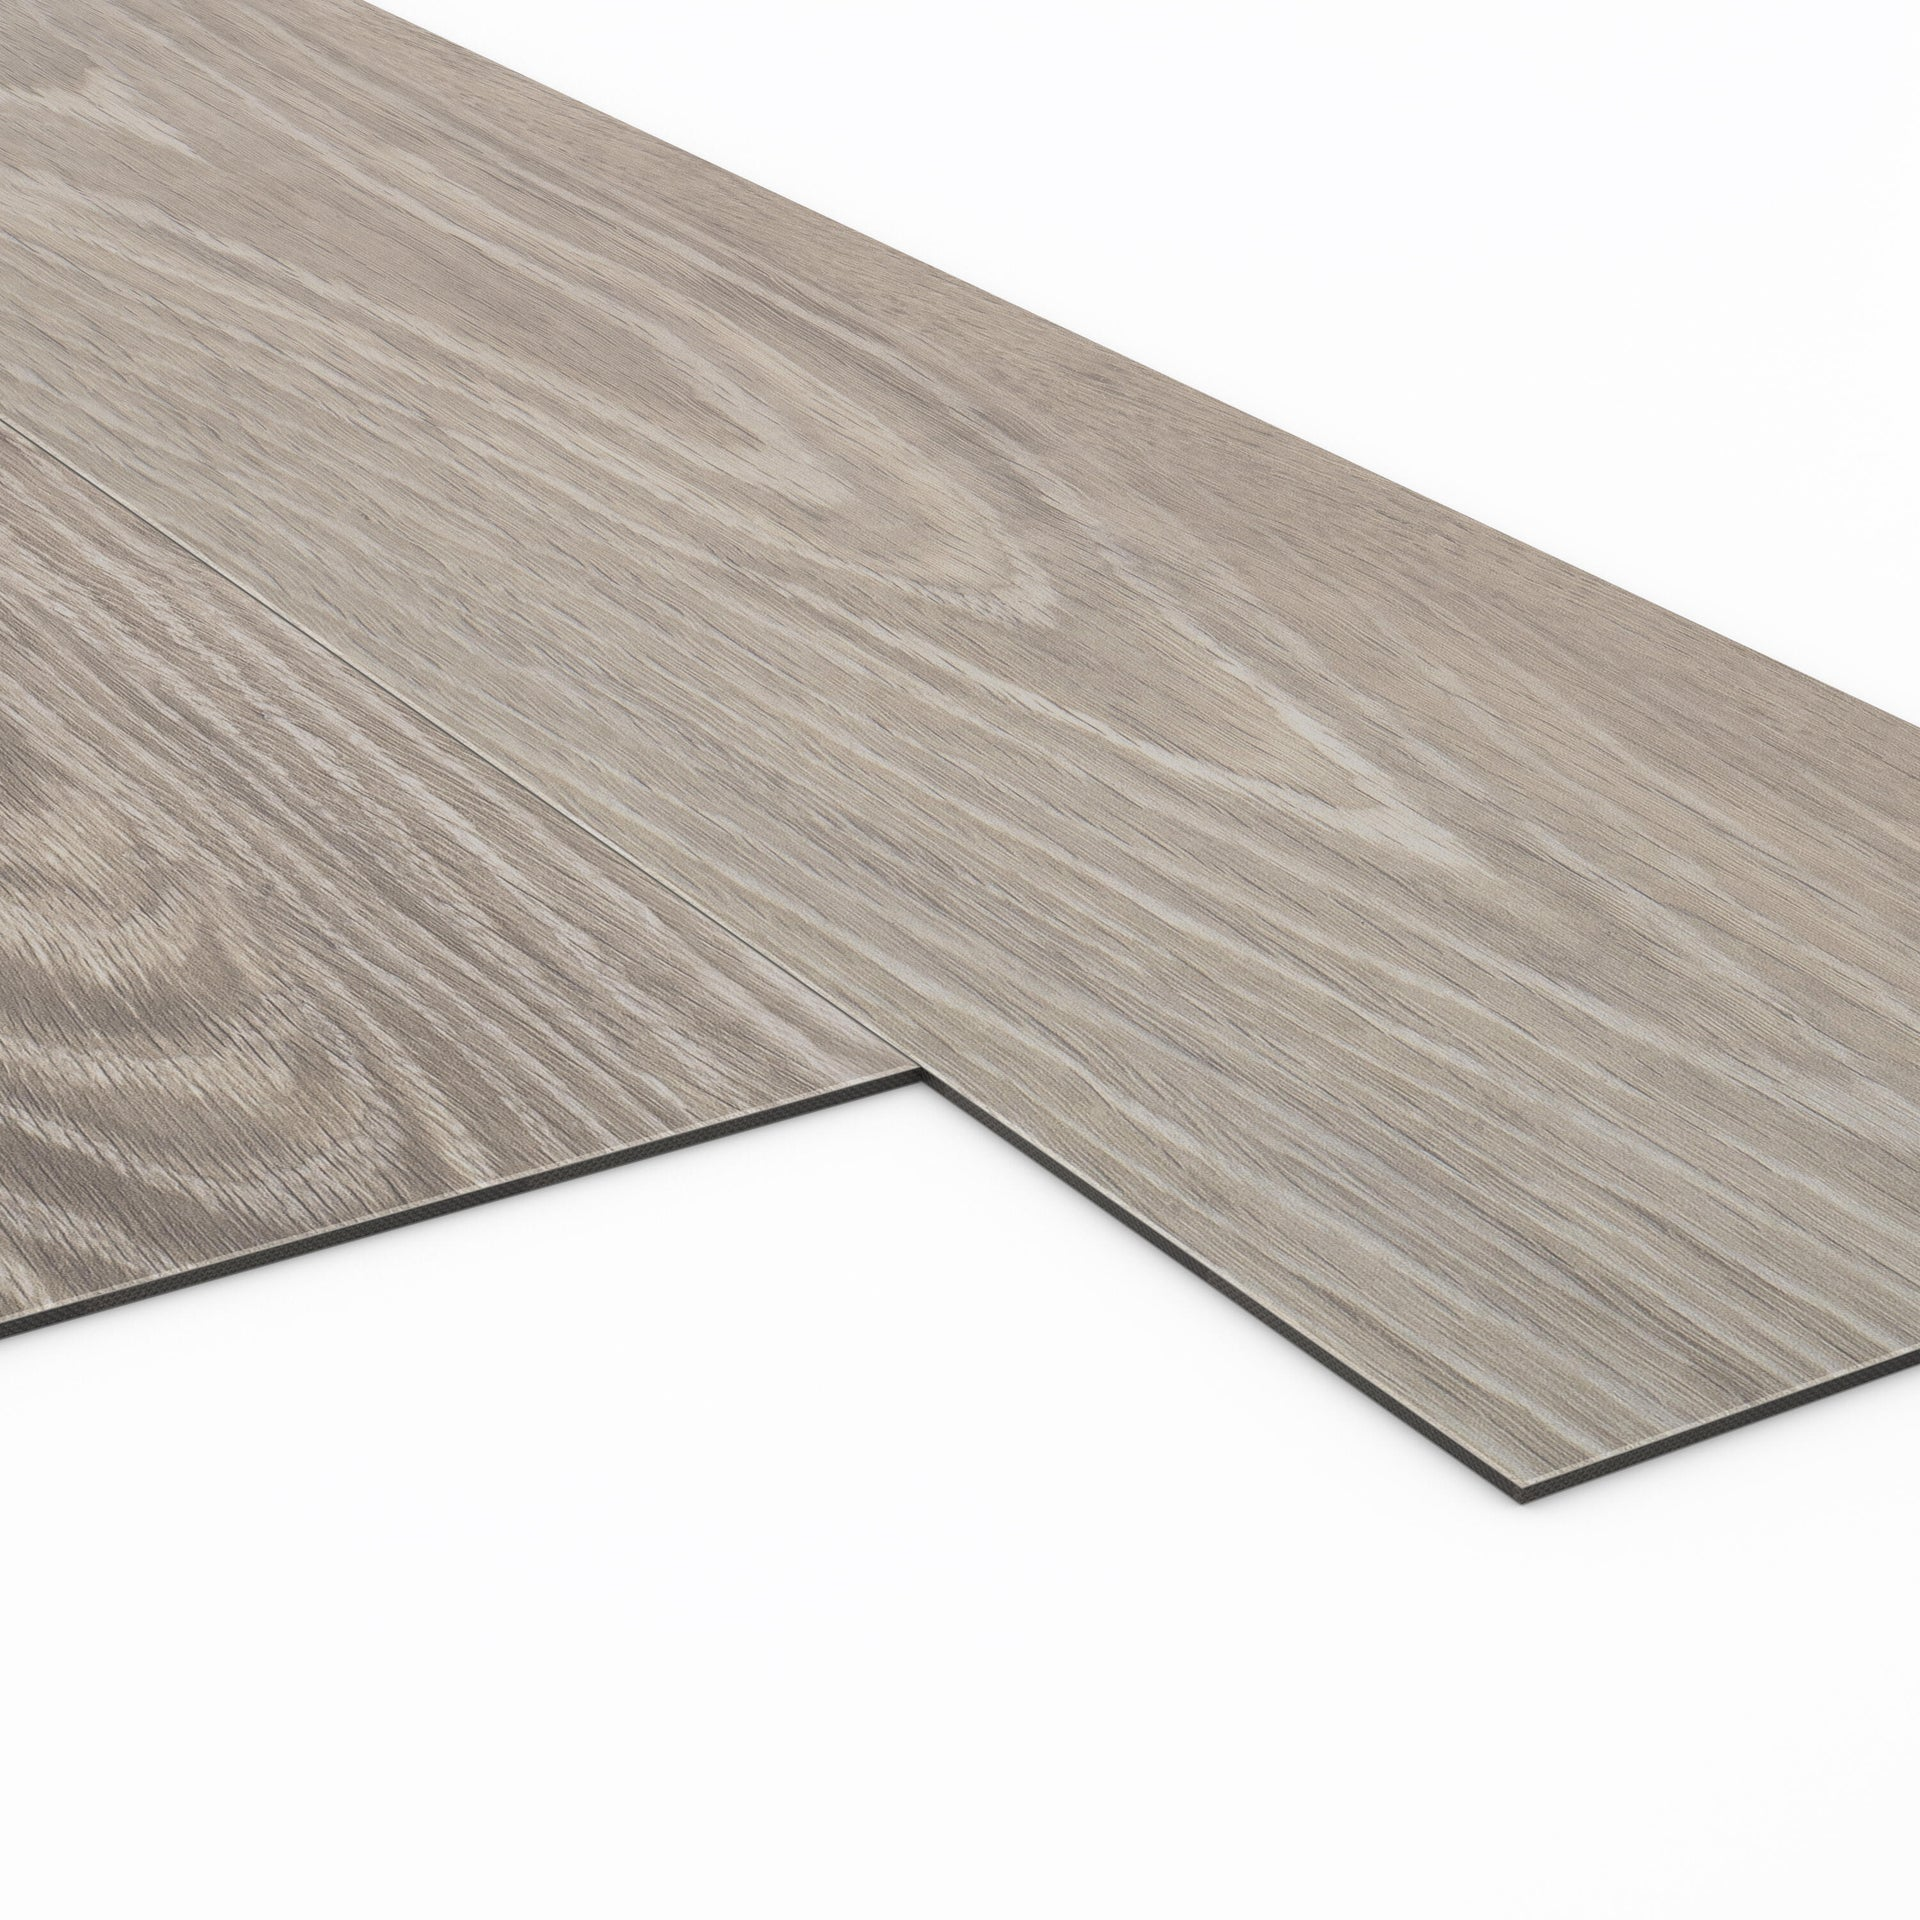 Pavimento PVC adesivo Senso Clublight Sp 2.5 mm beige - 2